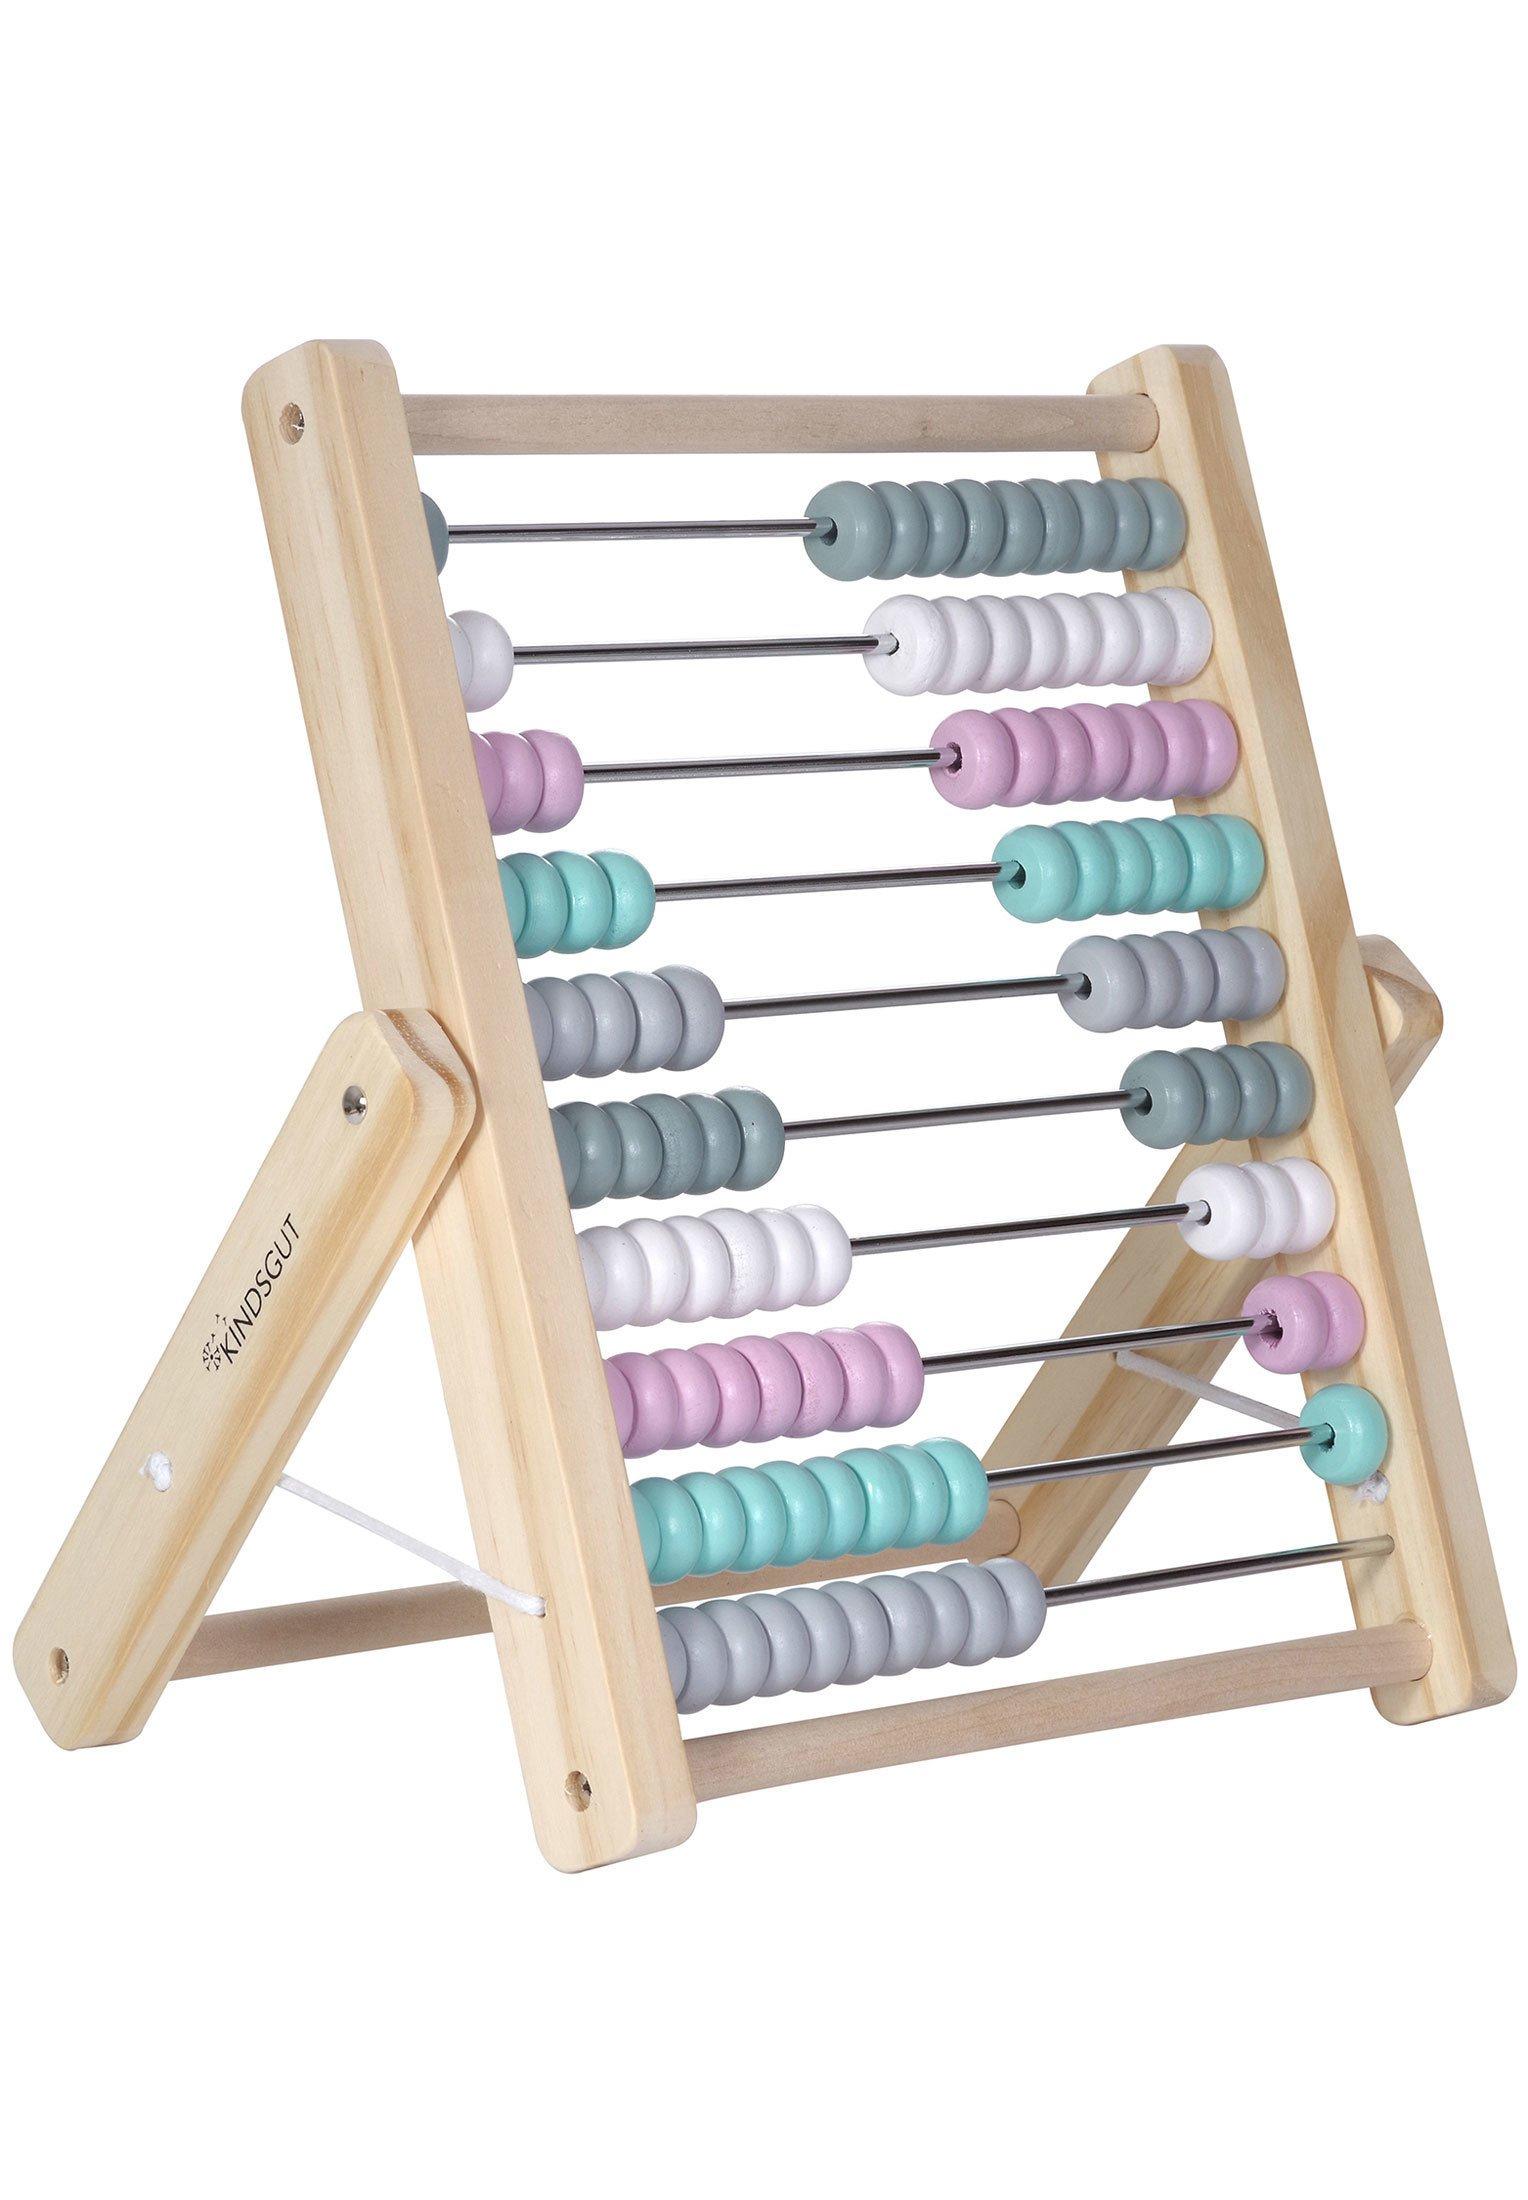 Kinder KINDSGUT ABAKUS RECHENSCHIEBER - Holzspielzeug